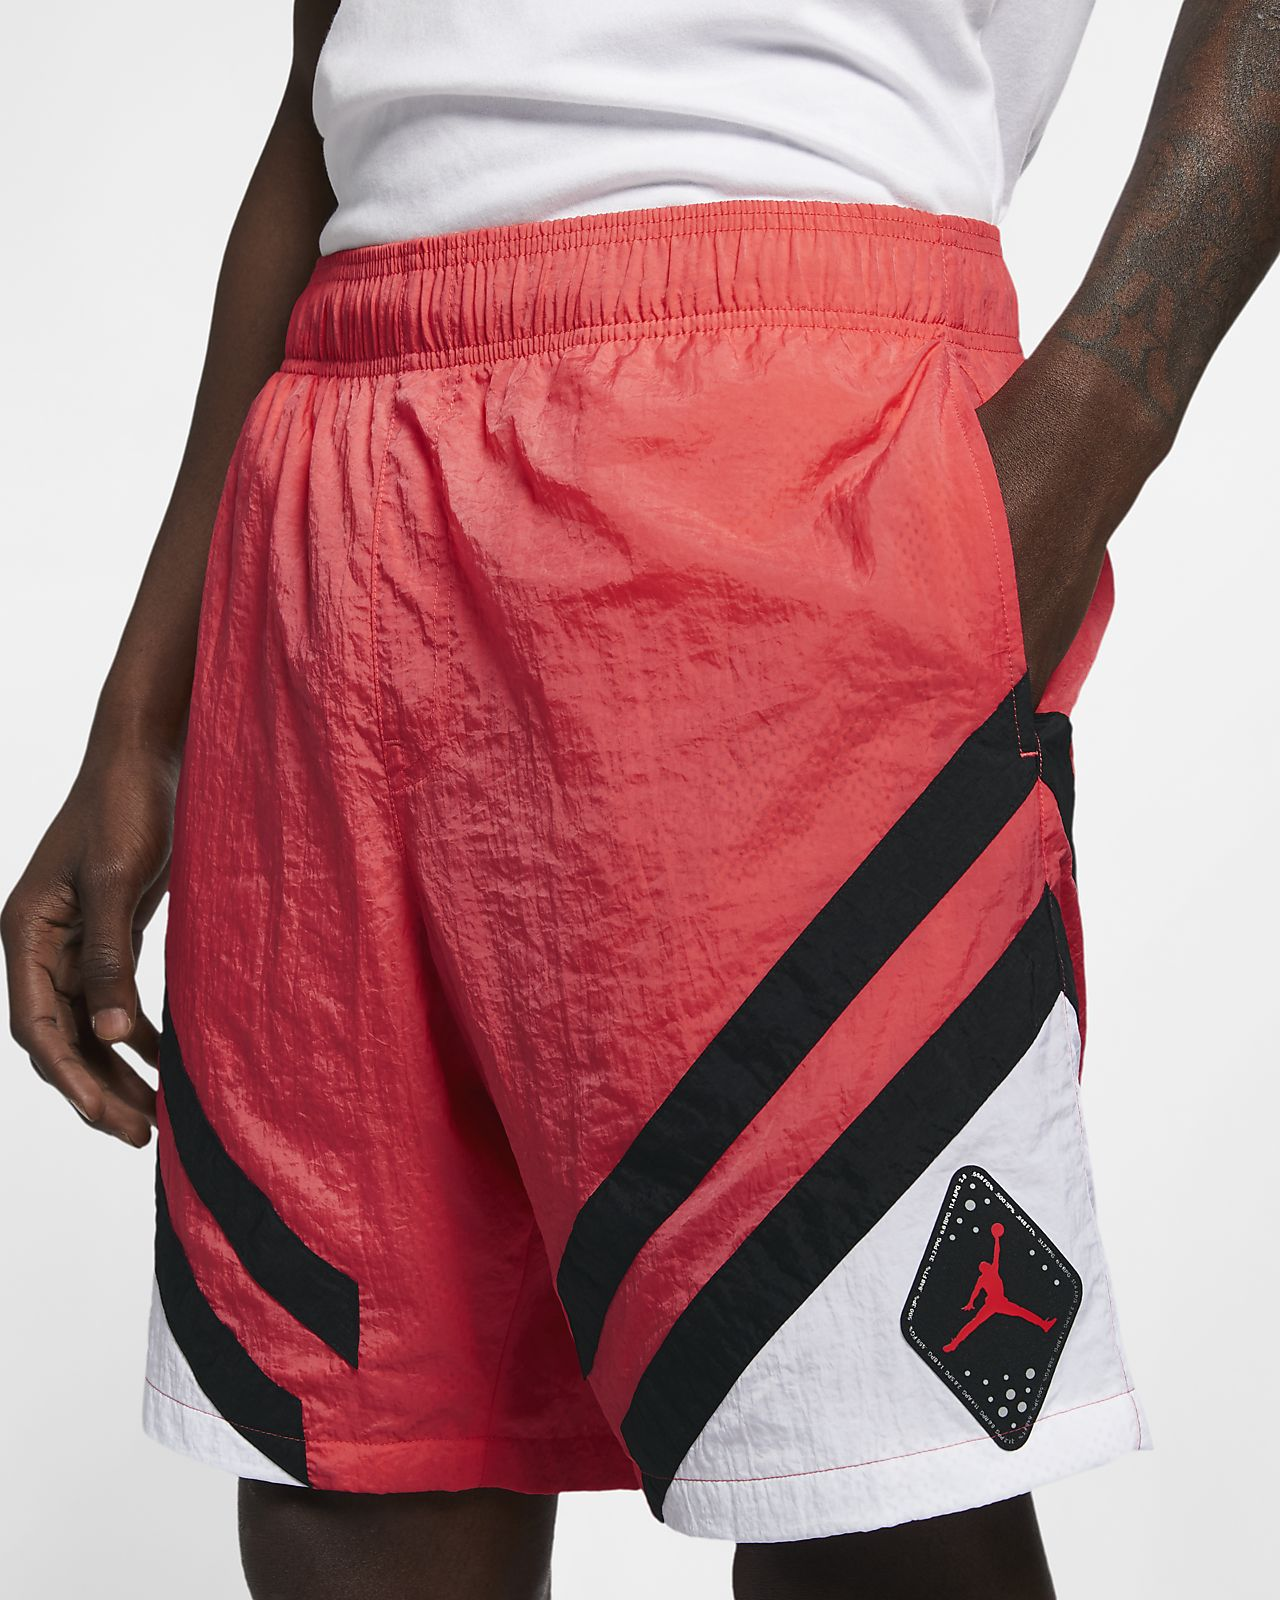 87f2bf9cf7b9 Jordan Legacy AJ 6 Men s Nylon Shorts. Nike.com GB